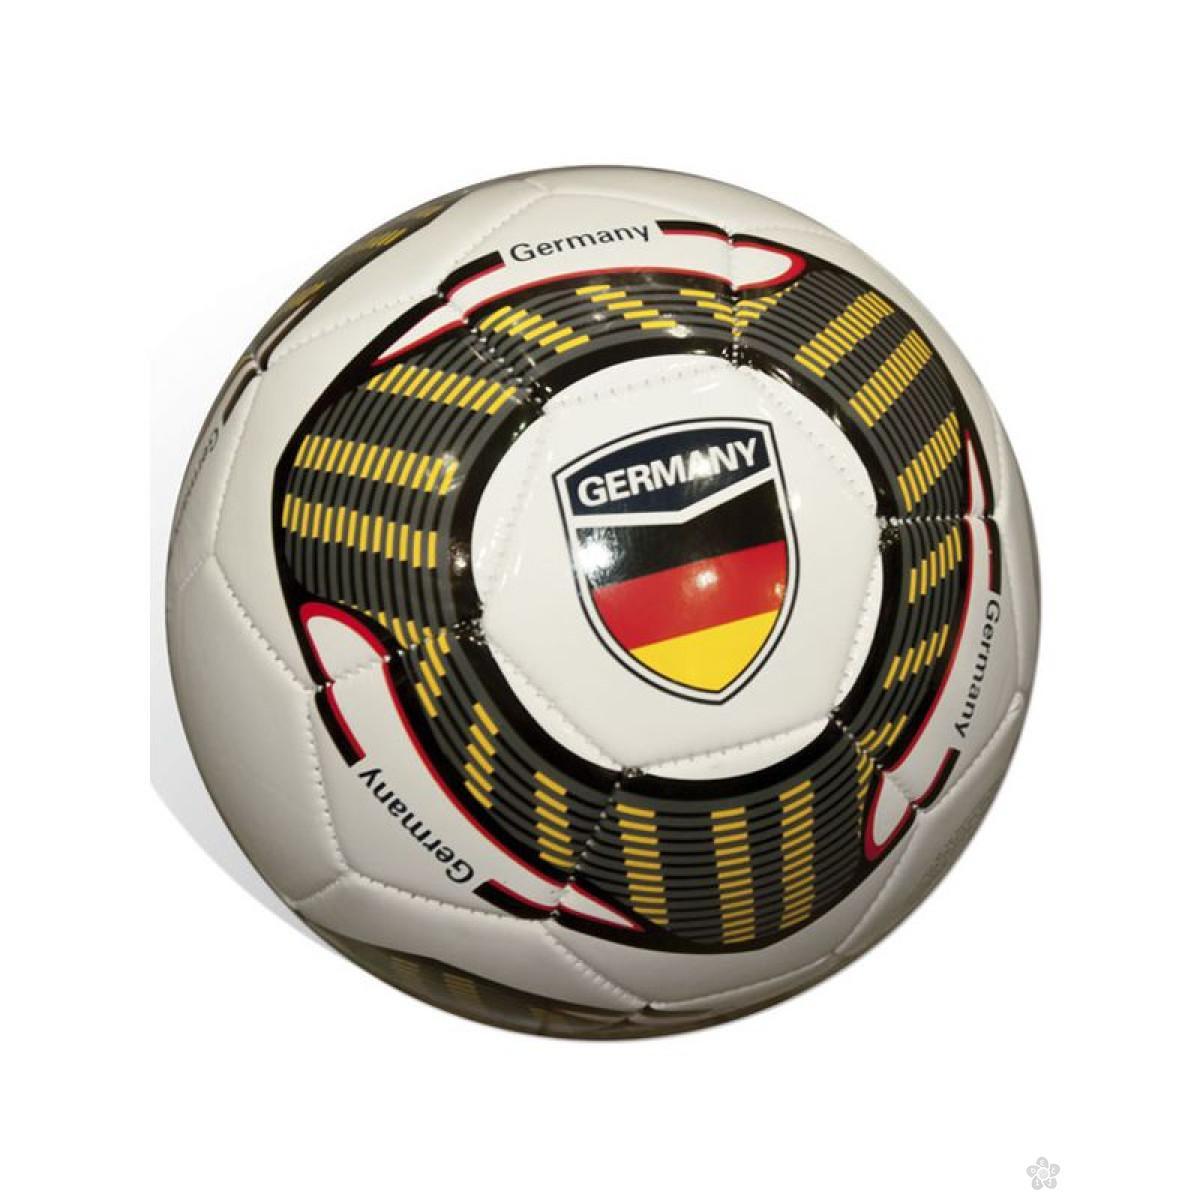 Fudbalska lopta - Nemačka